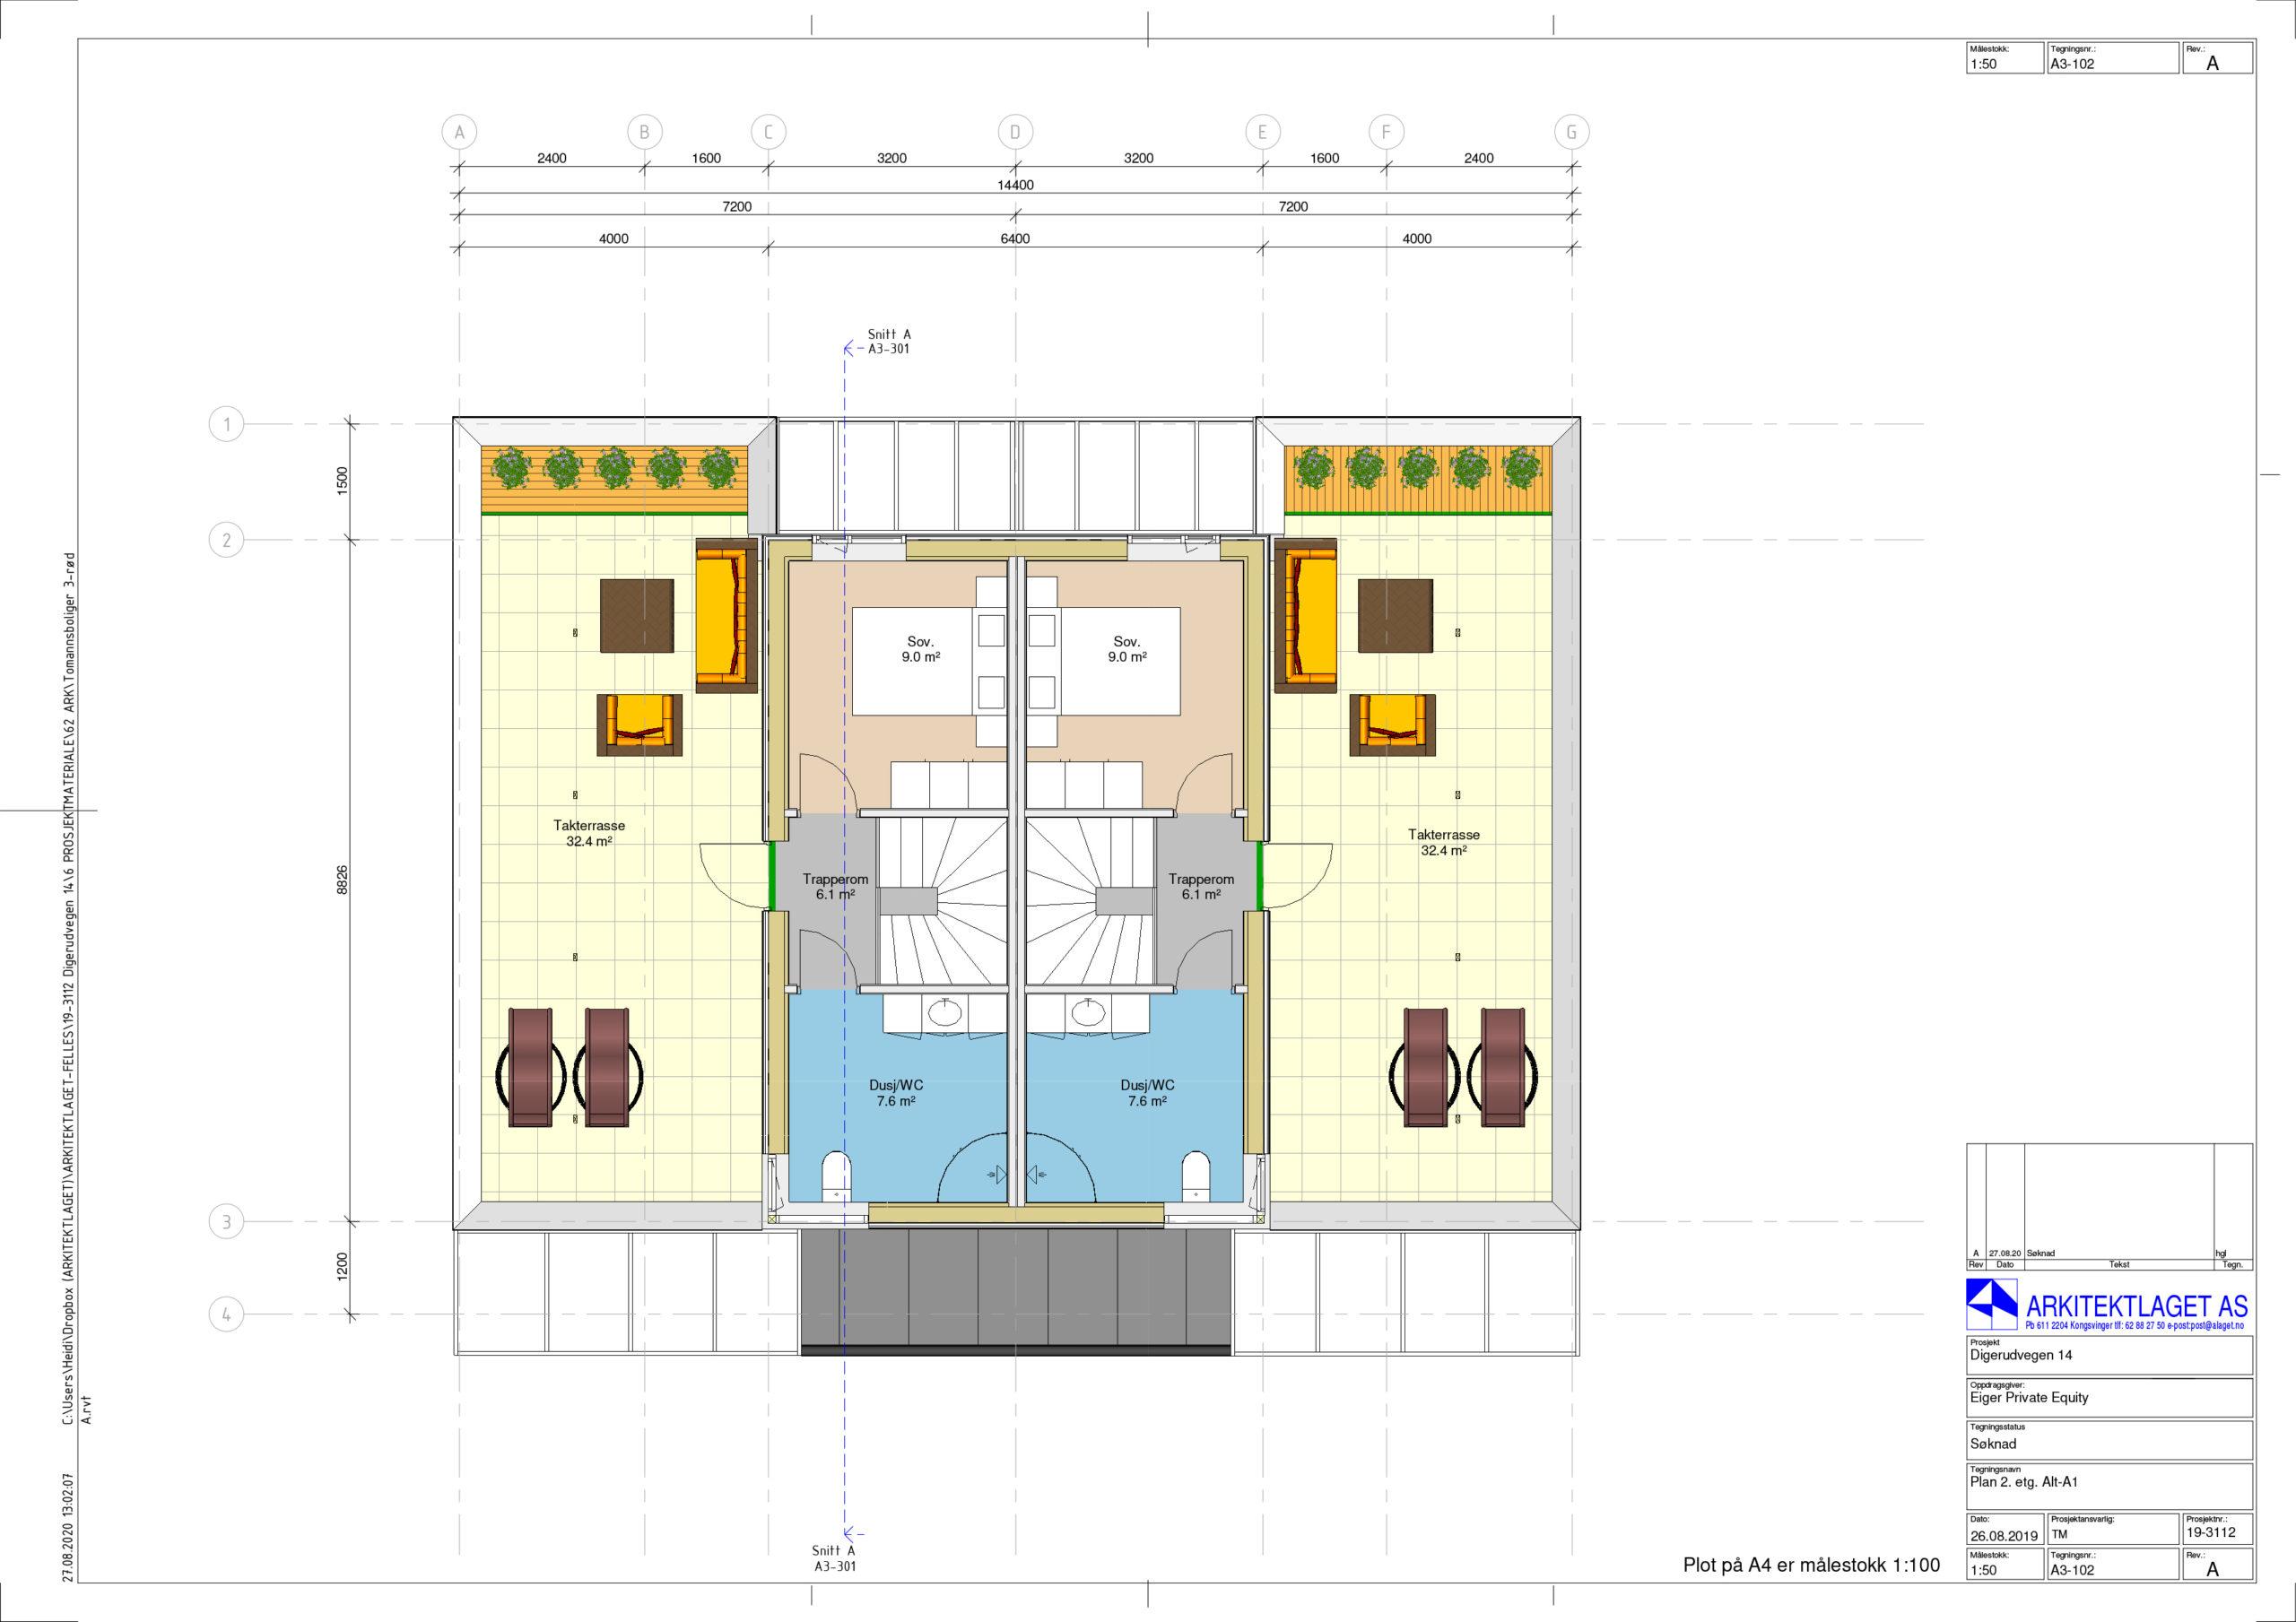 Plantegning av Digerudvegen plan2 toppetasje m takterrasse